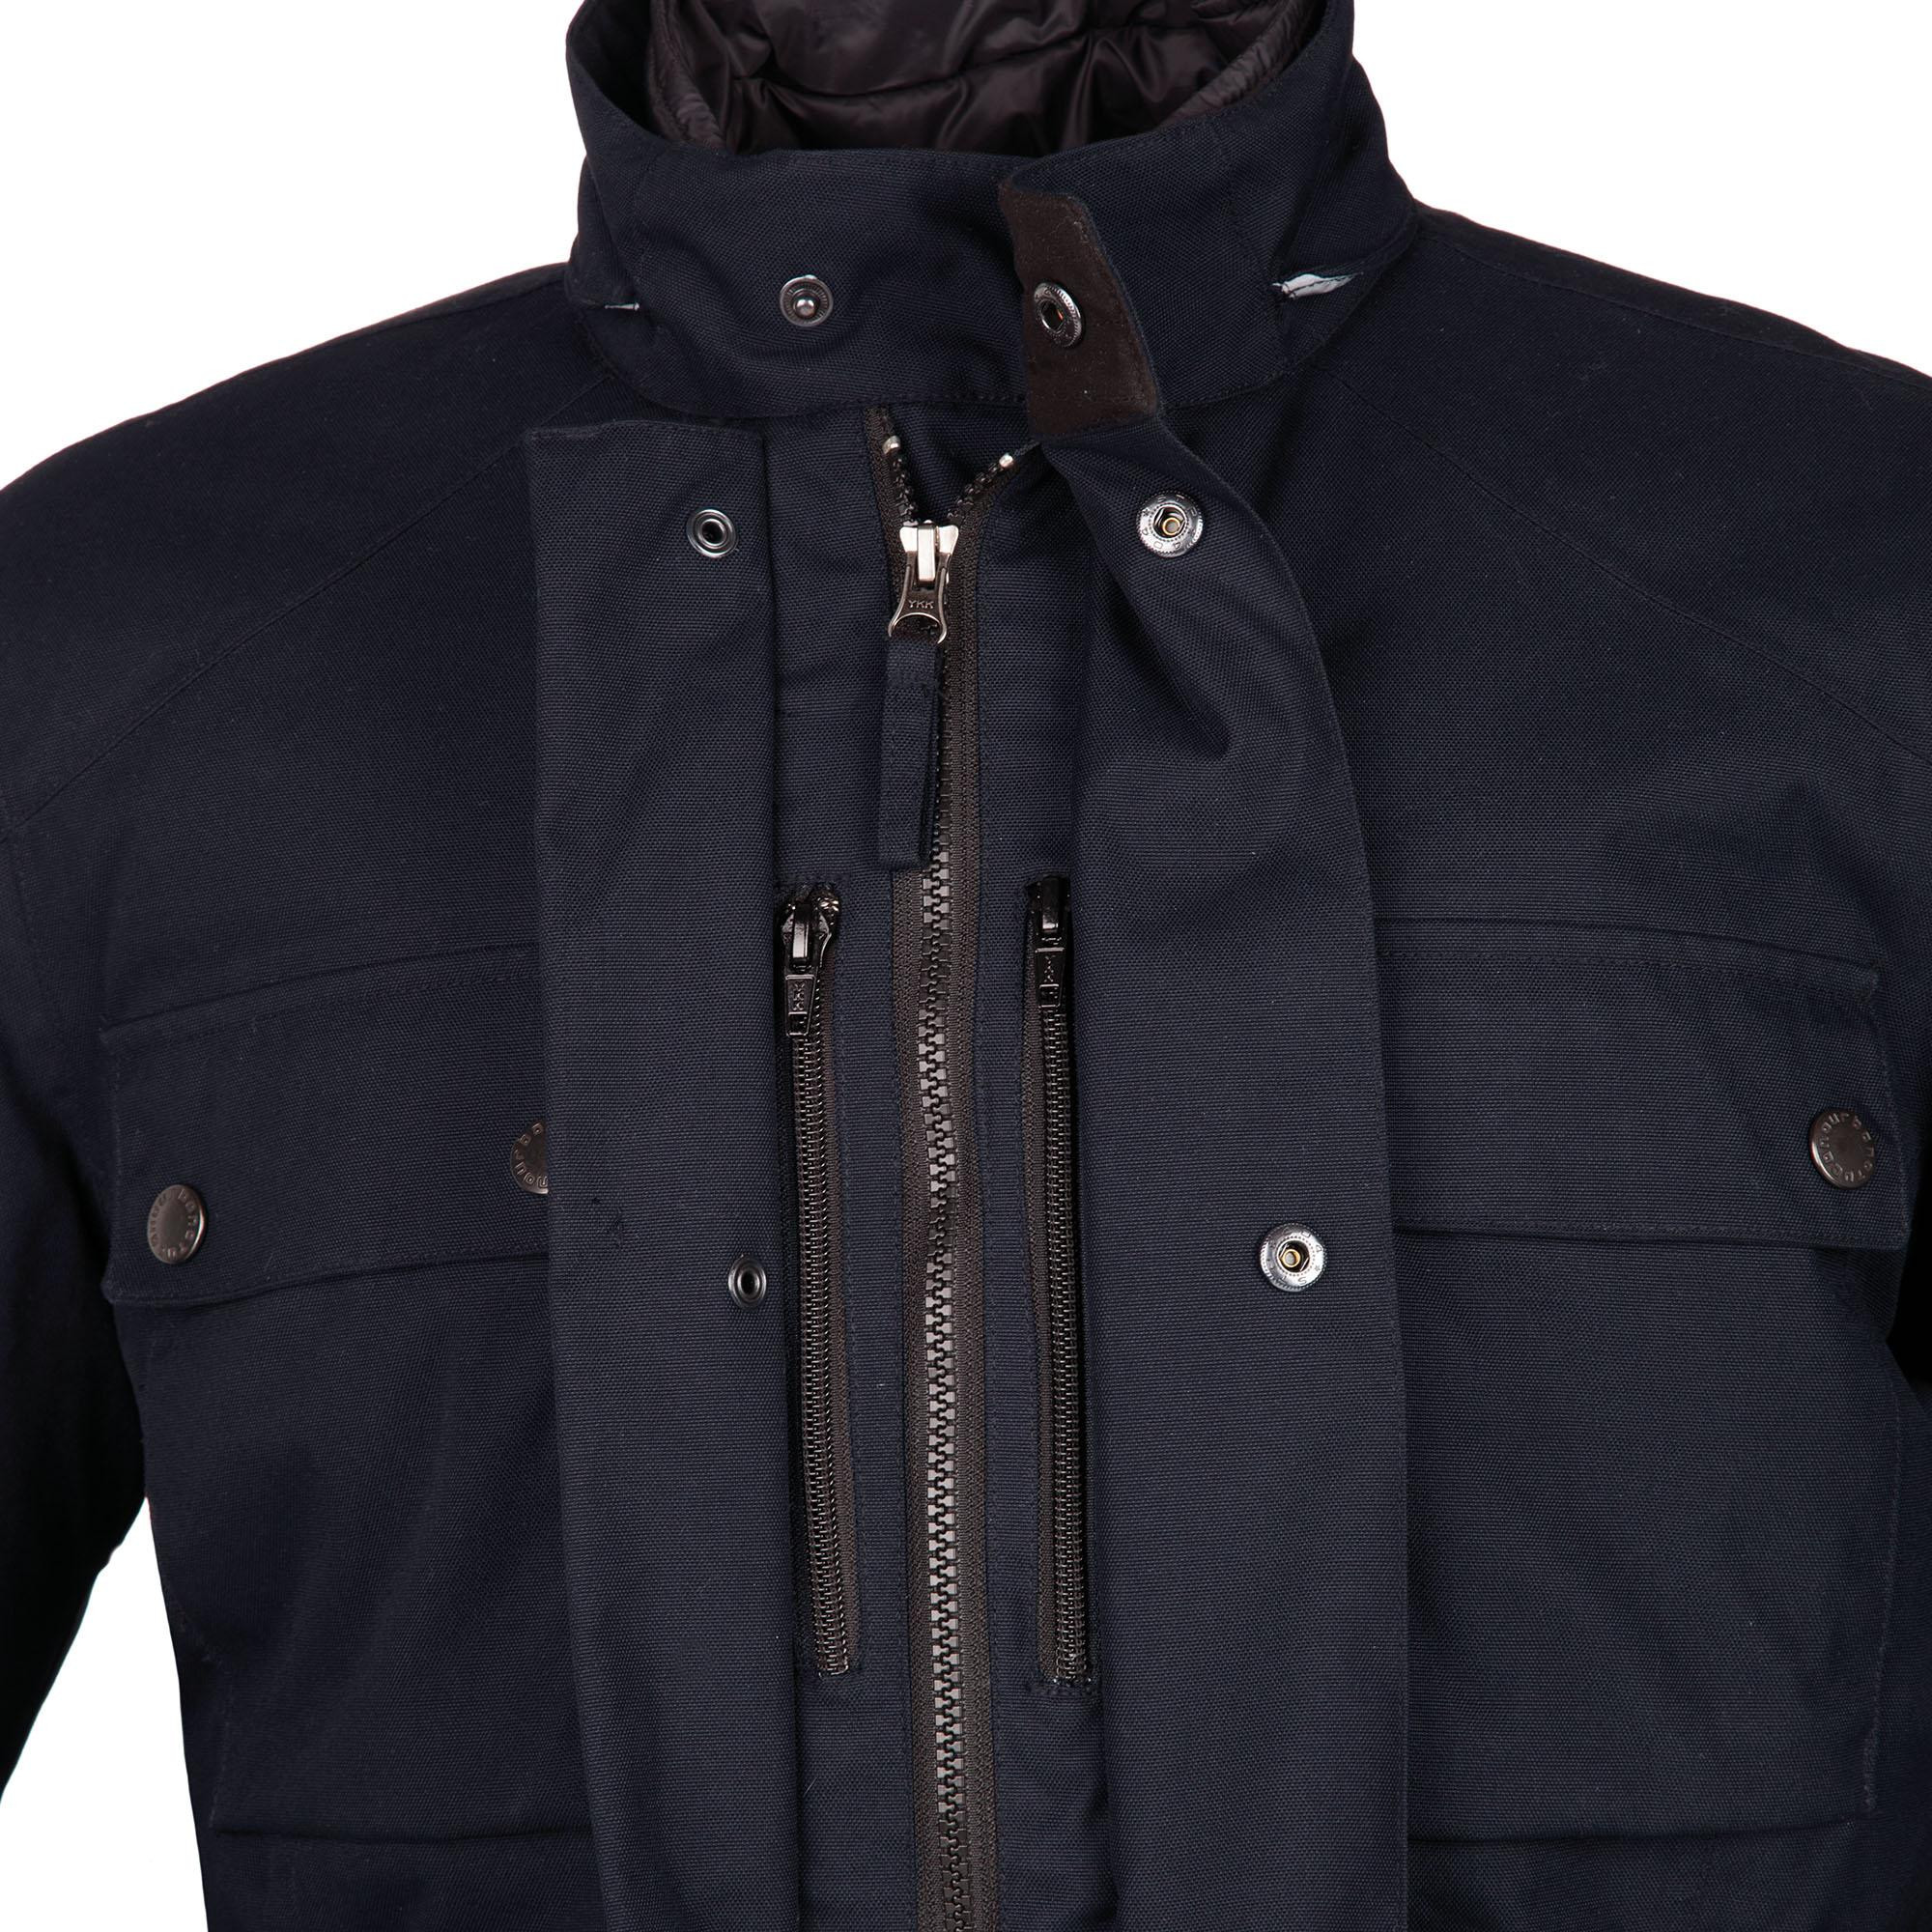 tucano urbano giacca uomo urbis